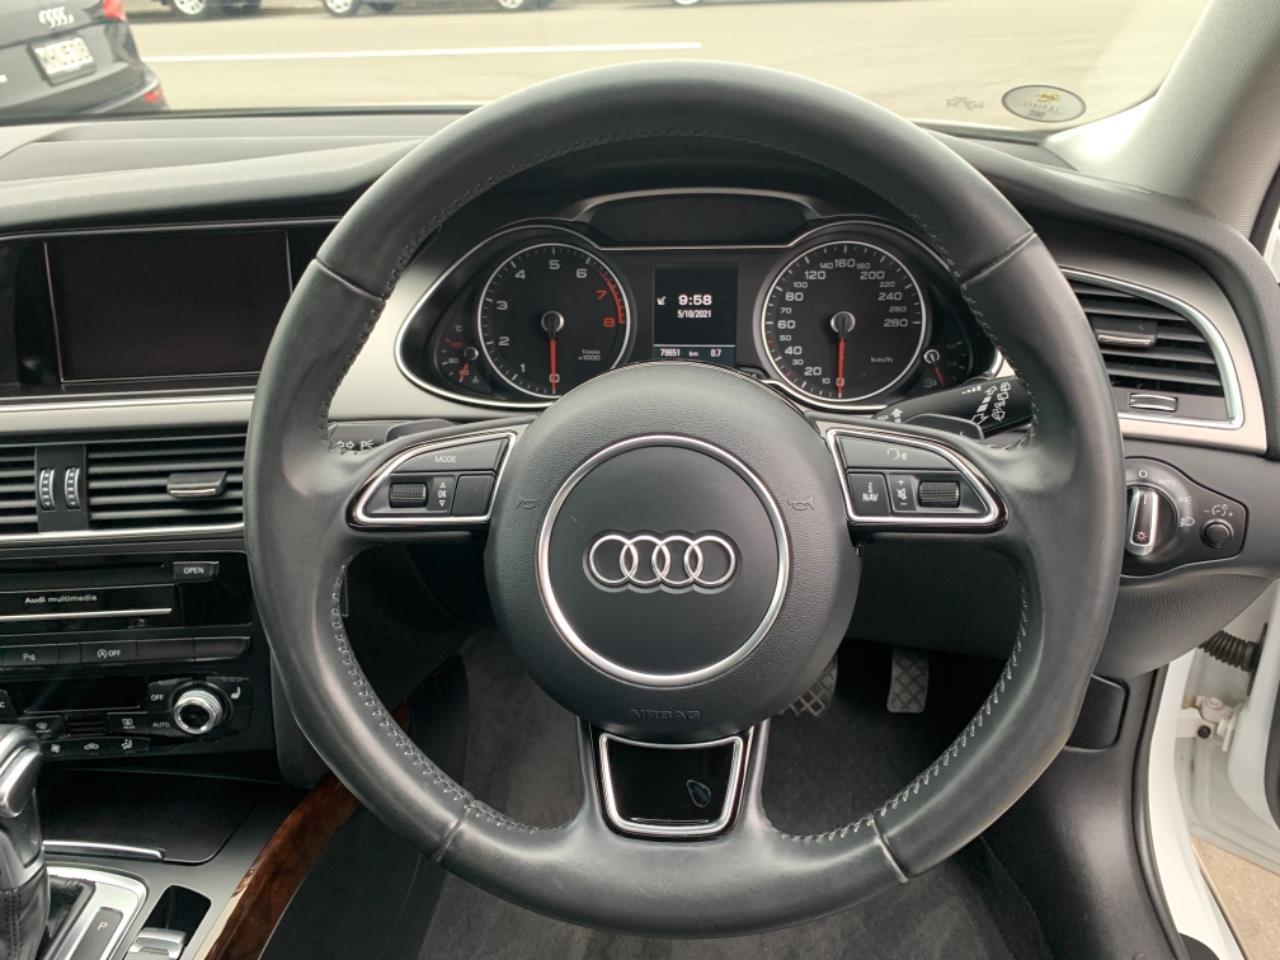 image-8, 2012 Audi A4 Allroad Quattro at Christchurch